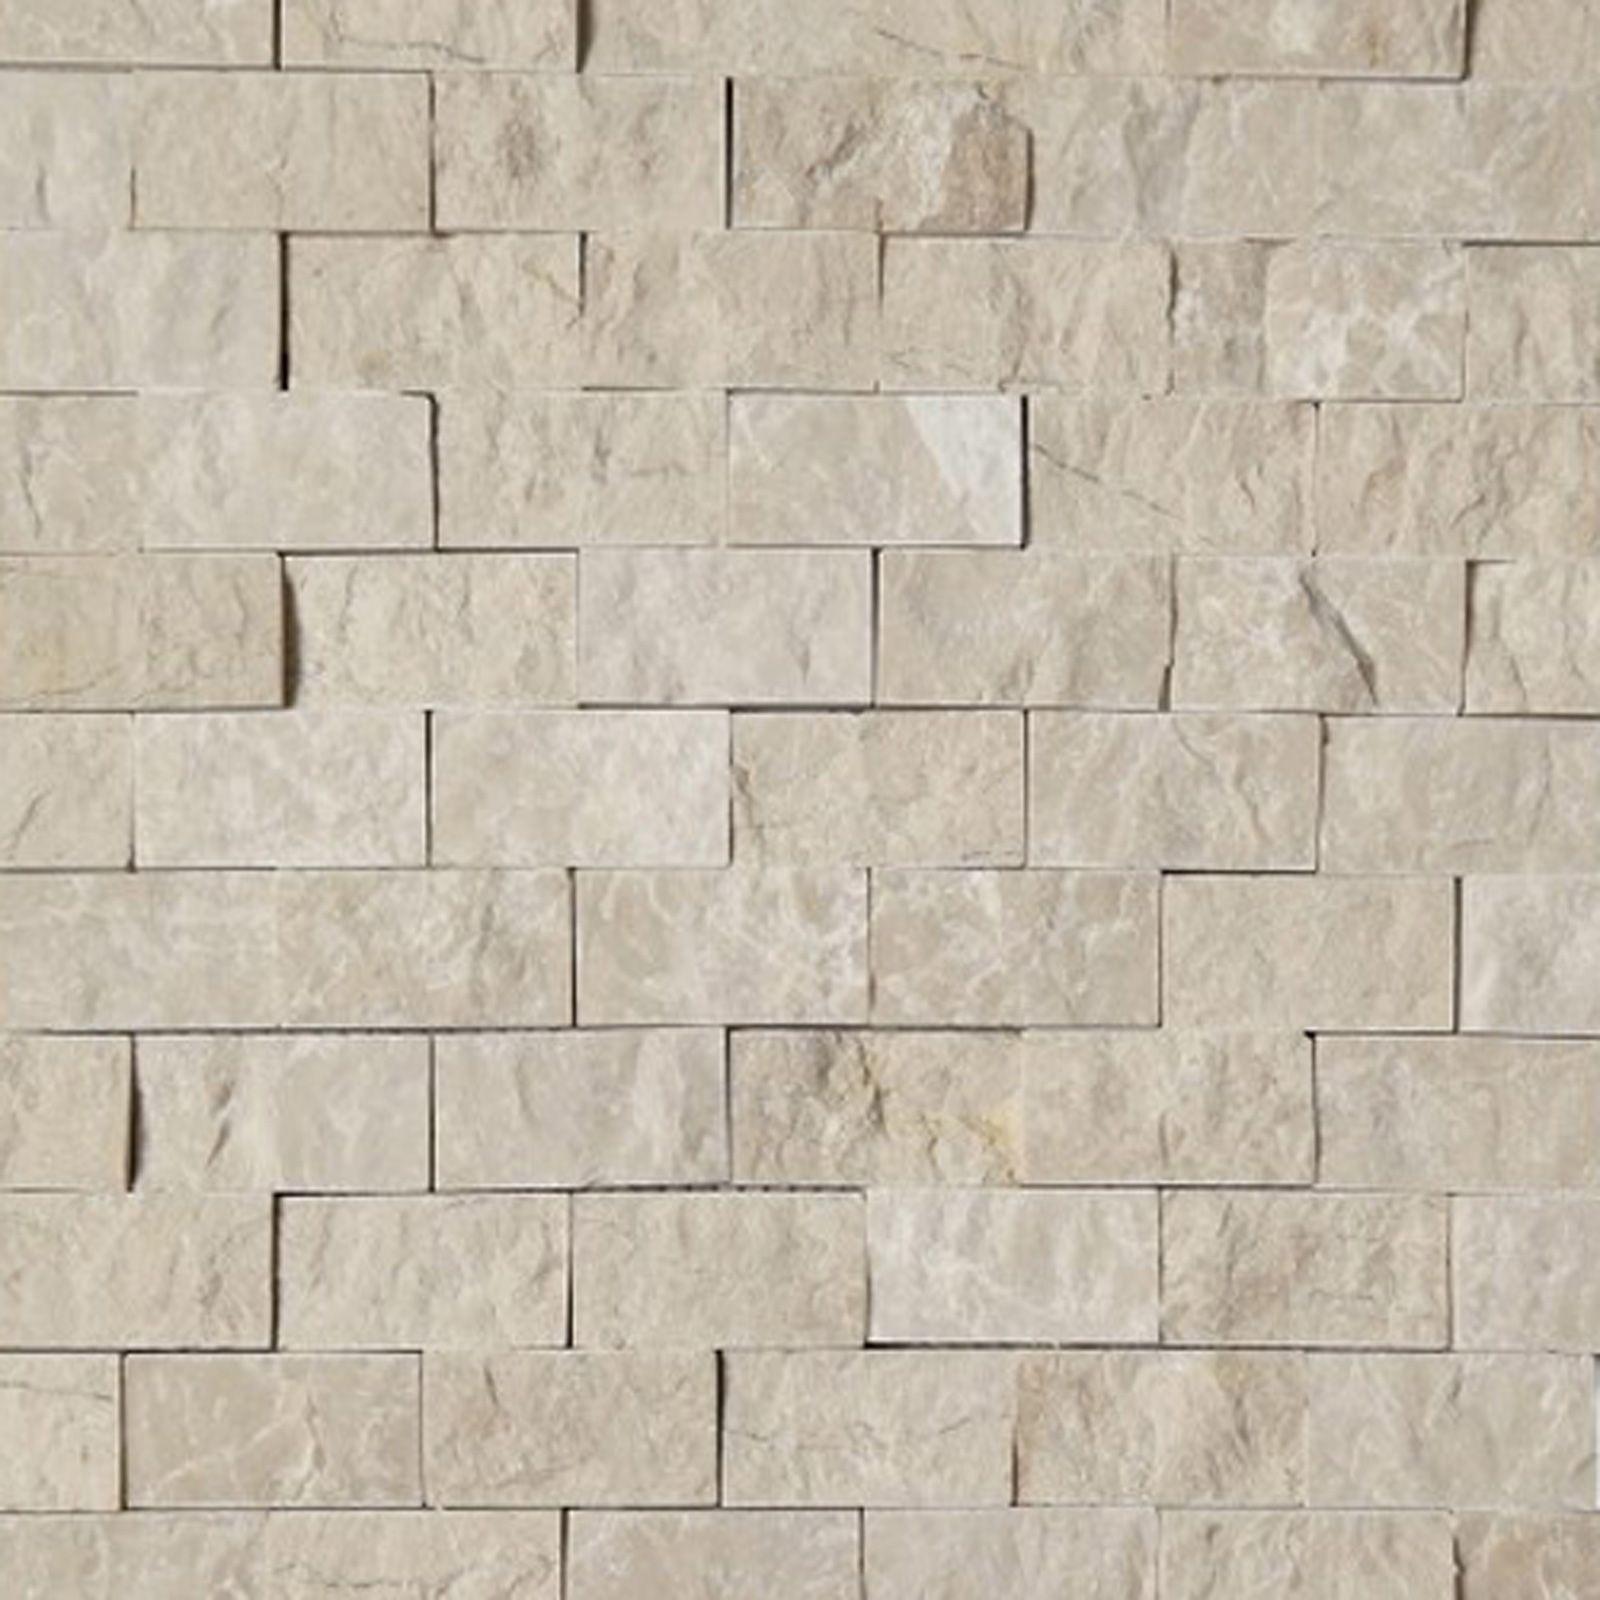 Kitchen Tiles Beige 1 x 2 split face mosaic tile beige marble honed wall floor tile